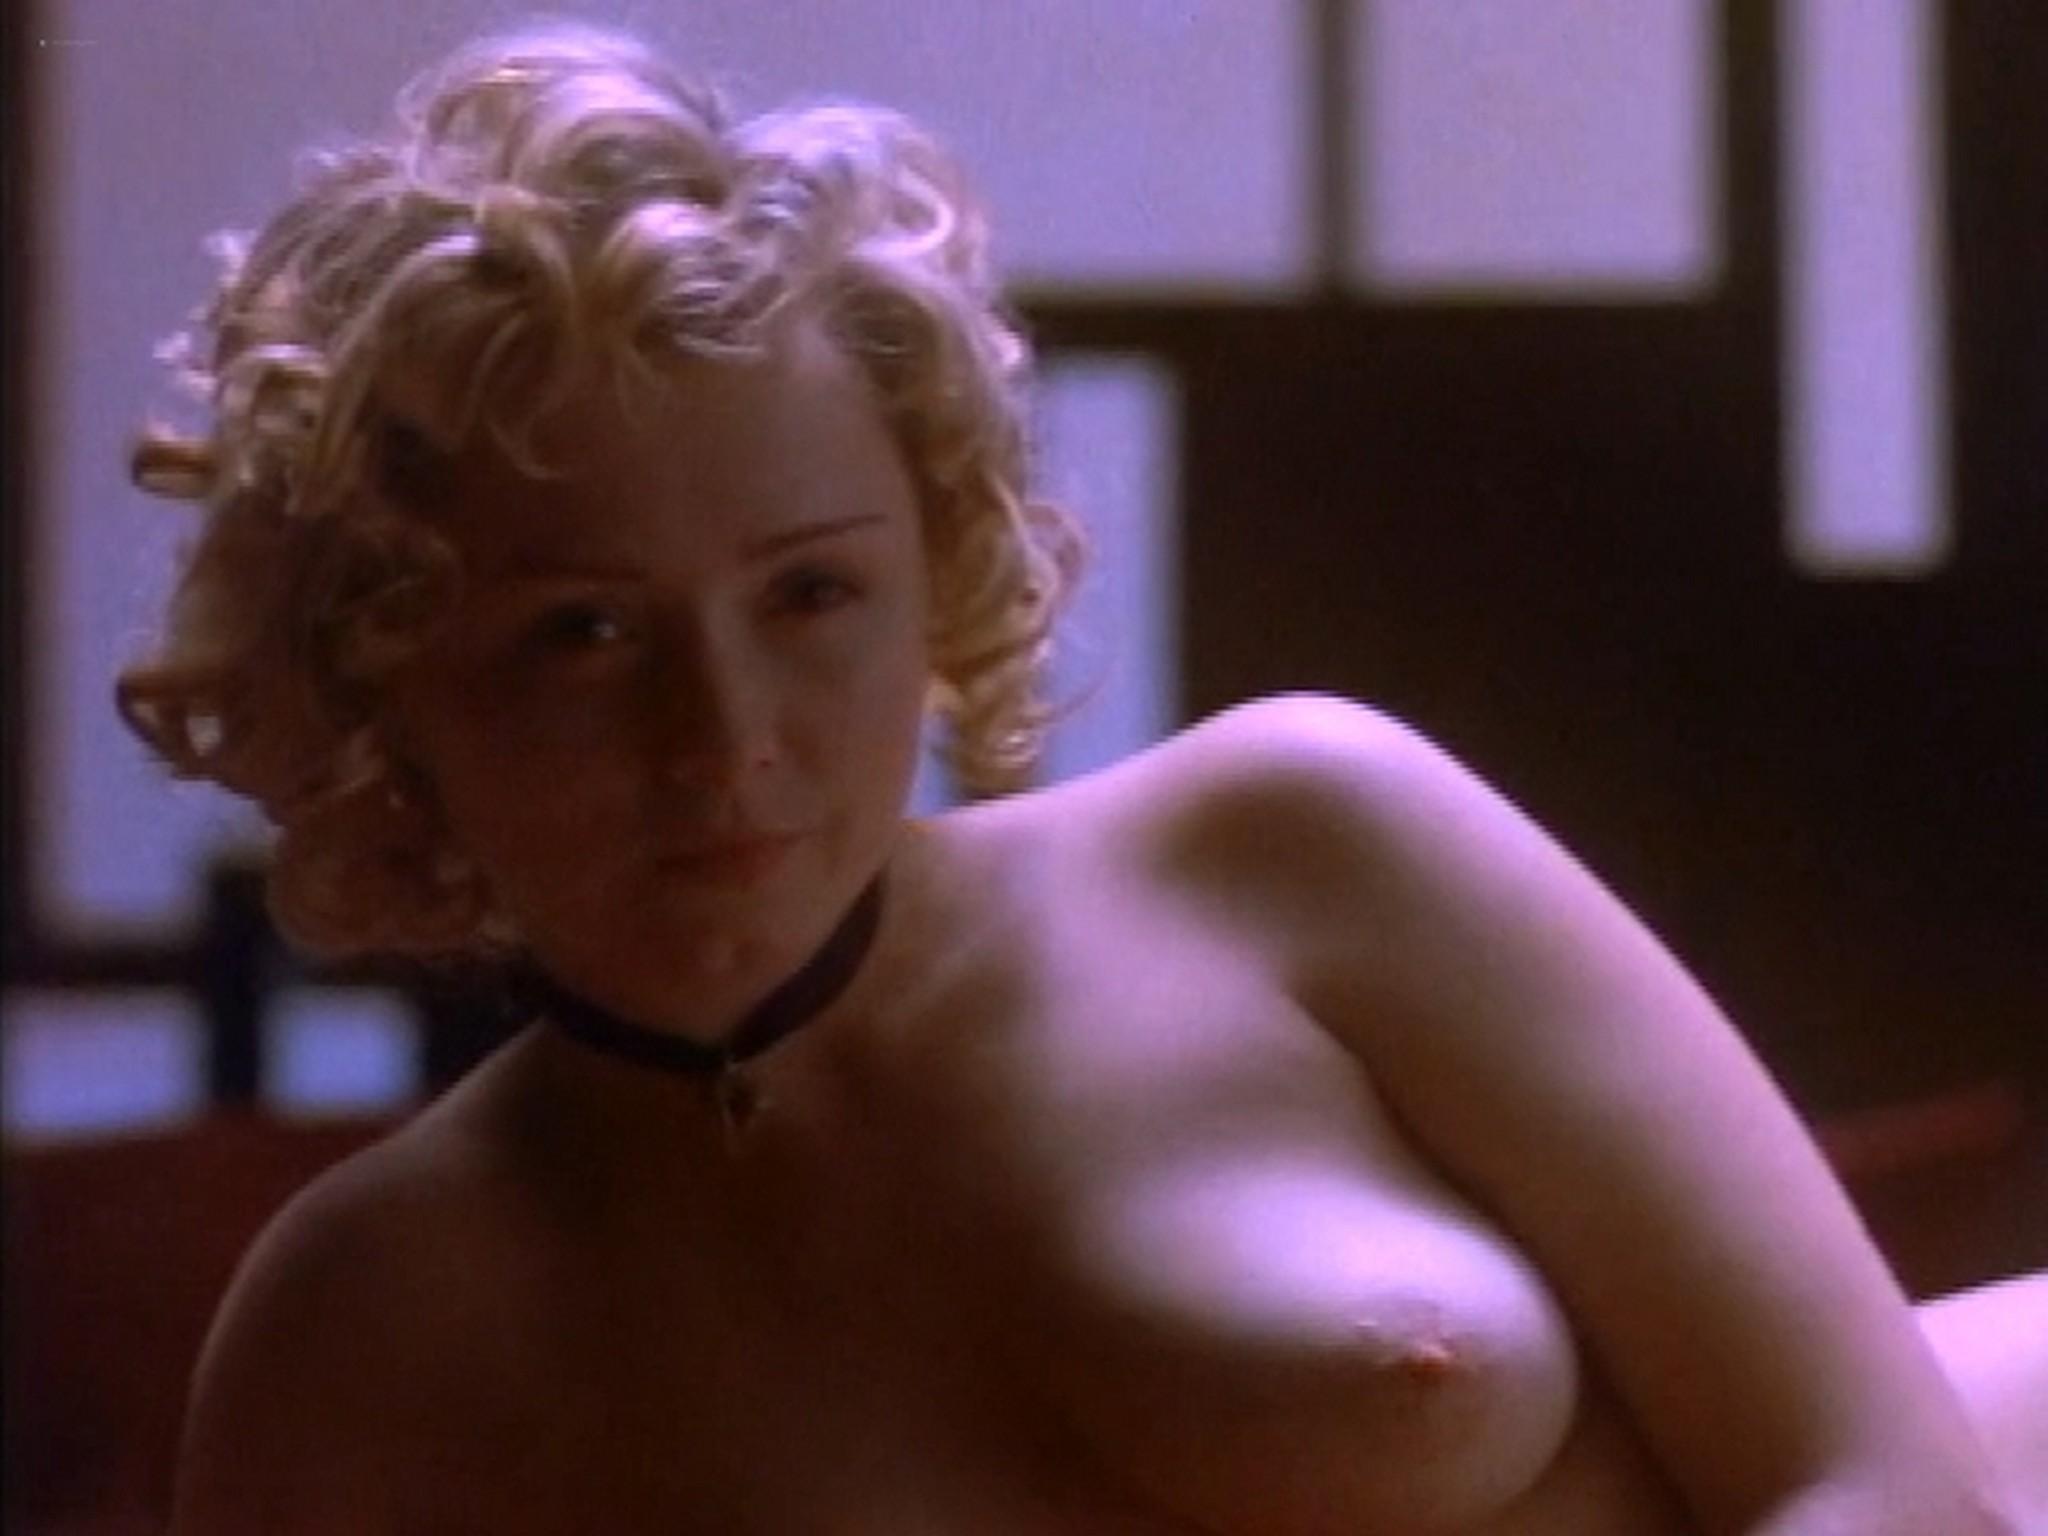 Nina Siemaszko nude sex Red Shoe Diaries Just Like That 1992 s1e5 Web 12